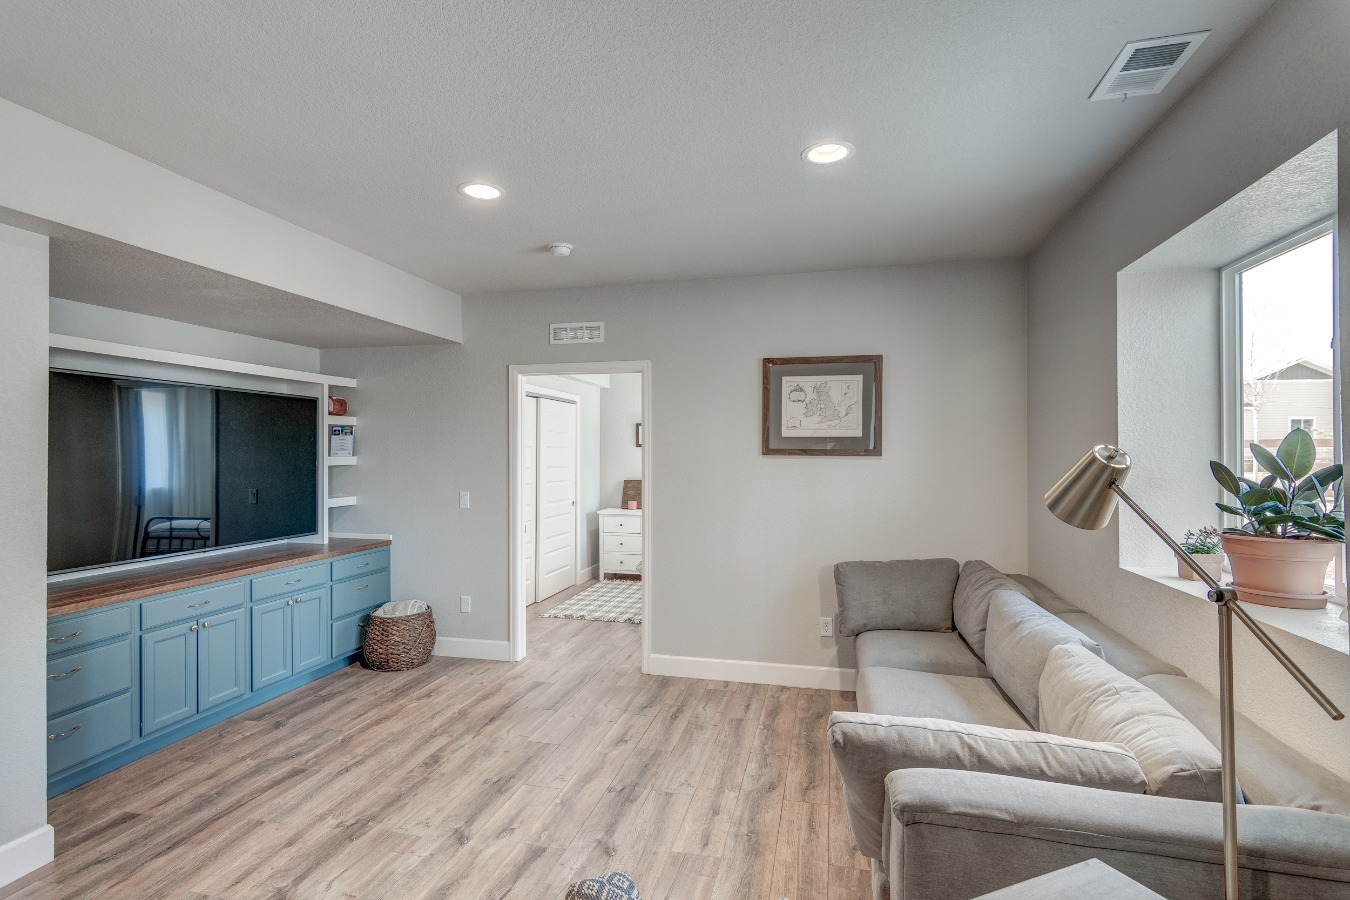 Built in Entertainment Center in Family Room